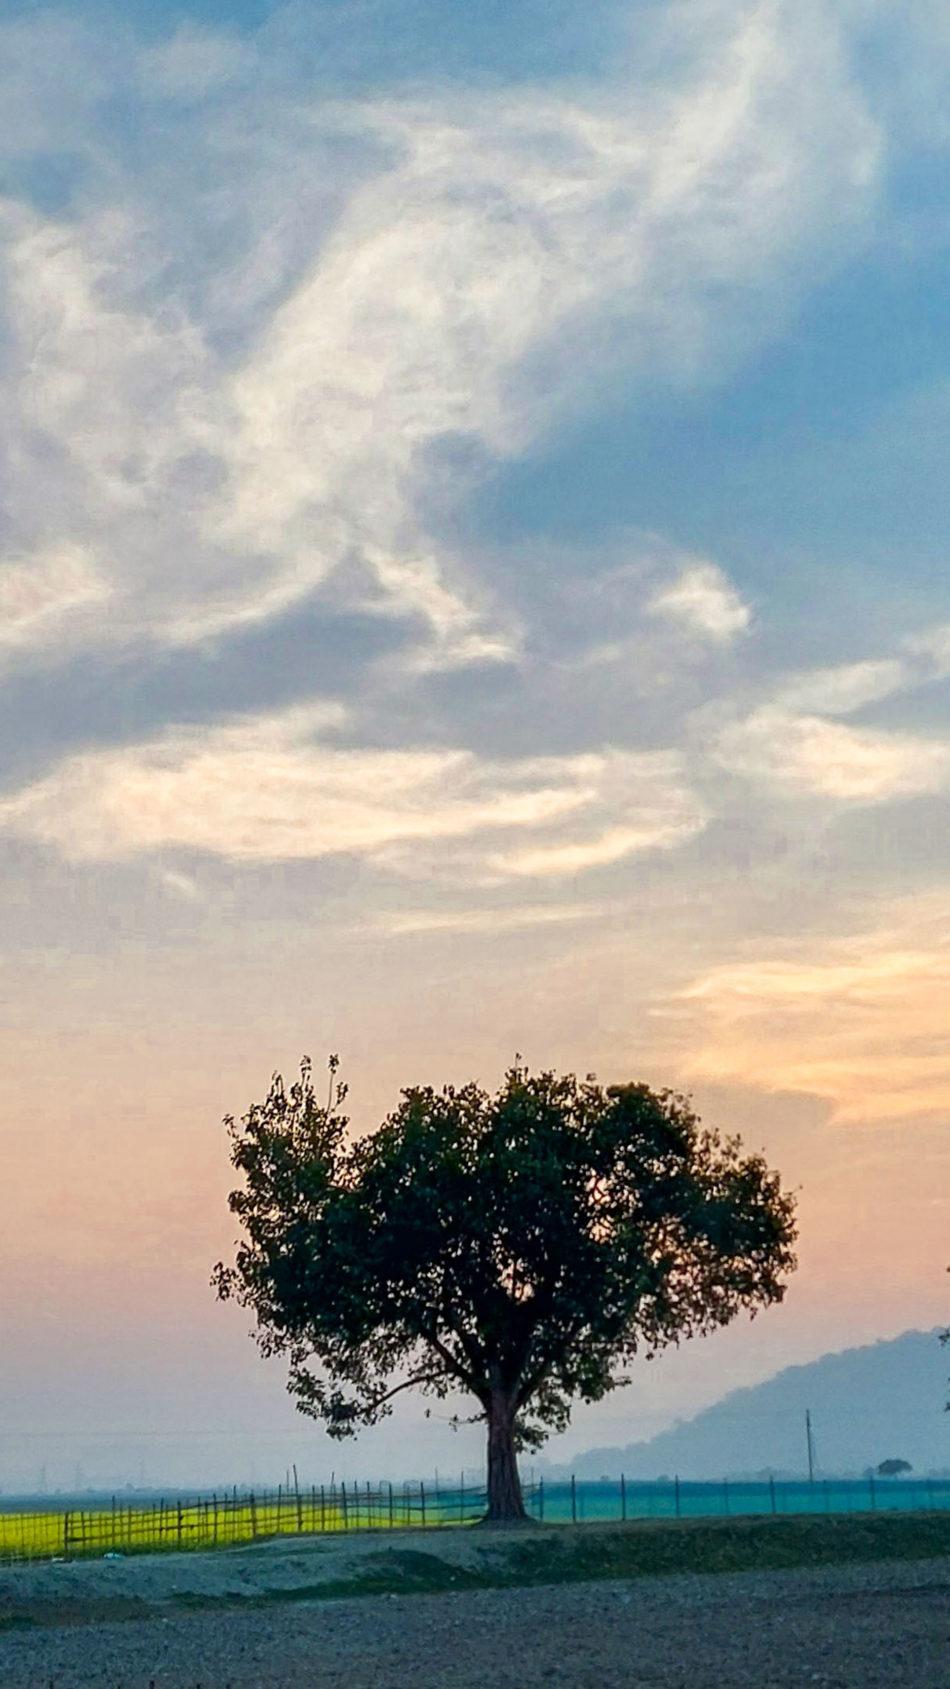 Tree Sunset Paddy Field 4K Ultra HD Mobile Wallpaper